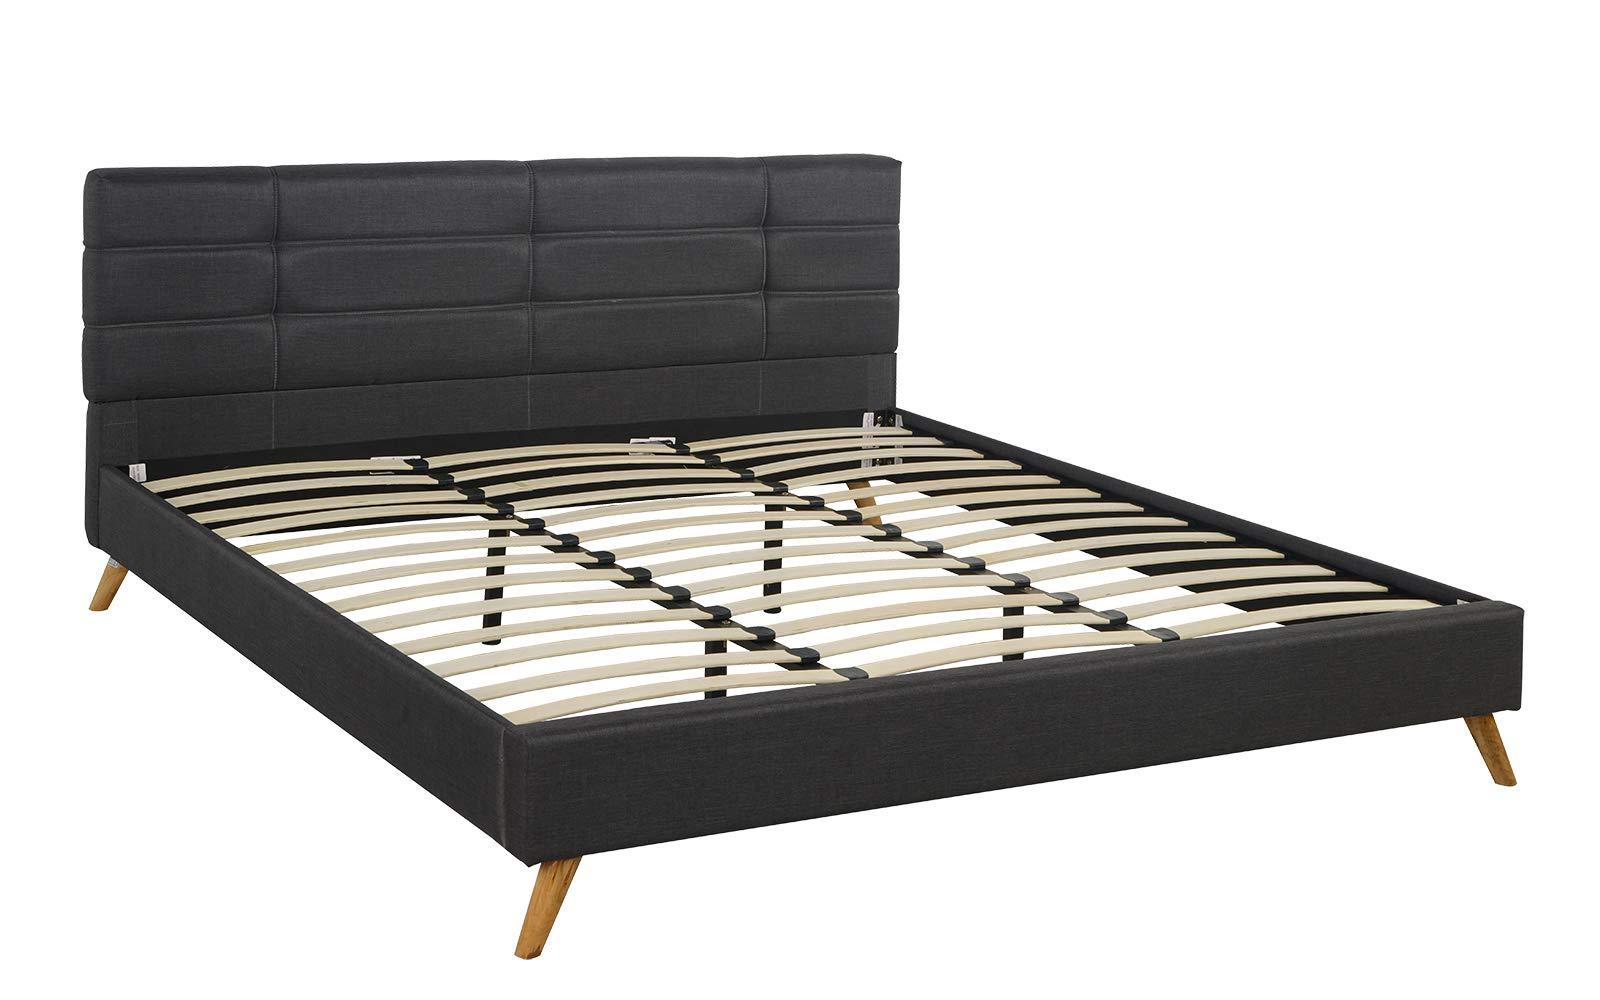 DIVANO ROMA FURNITURE Mid-Century Linen Platform Bed Frame with Pleated Headboard Design (King, Dark Grey)